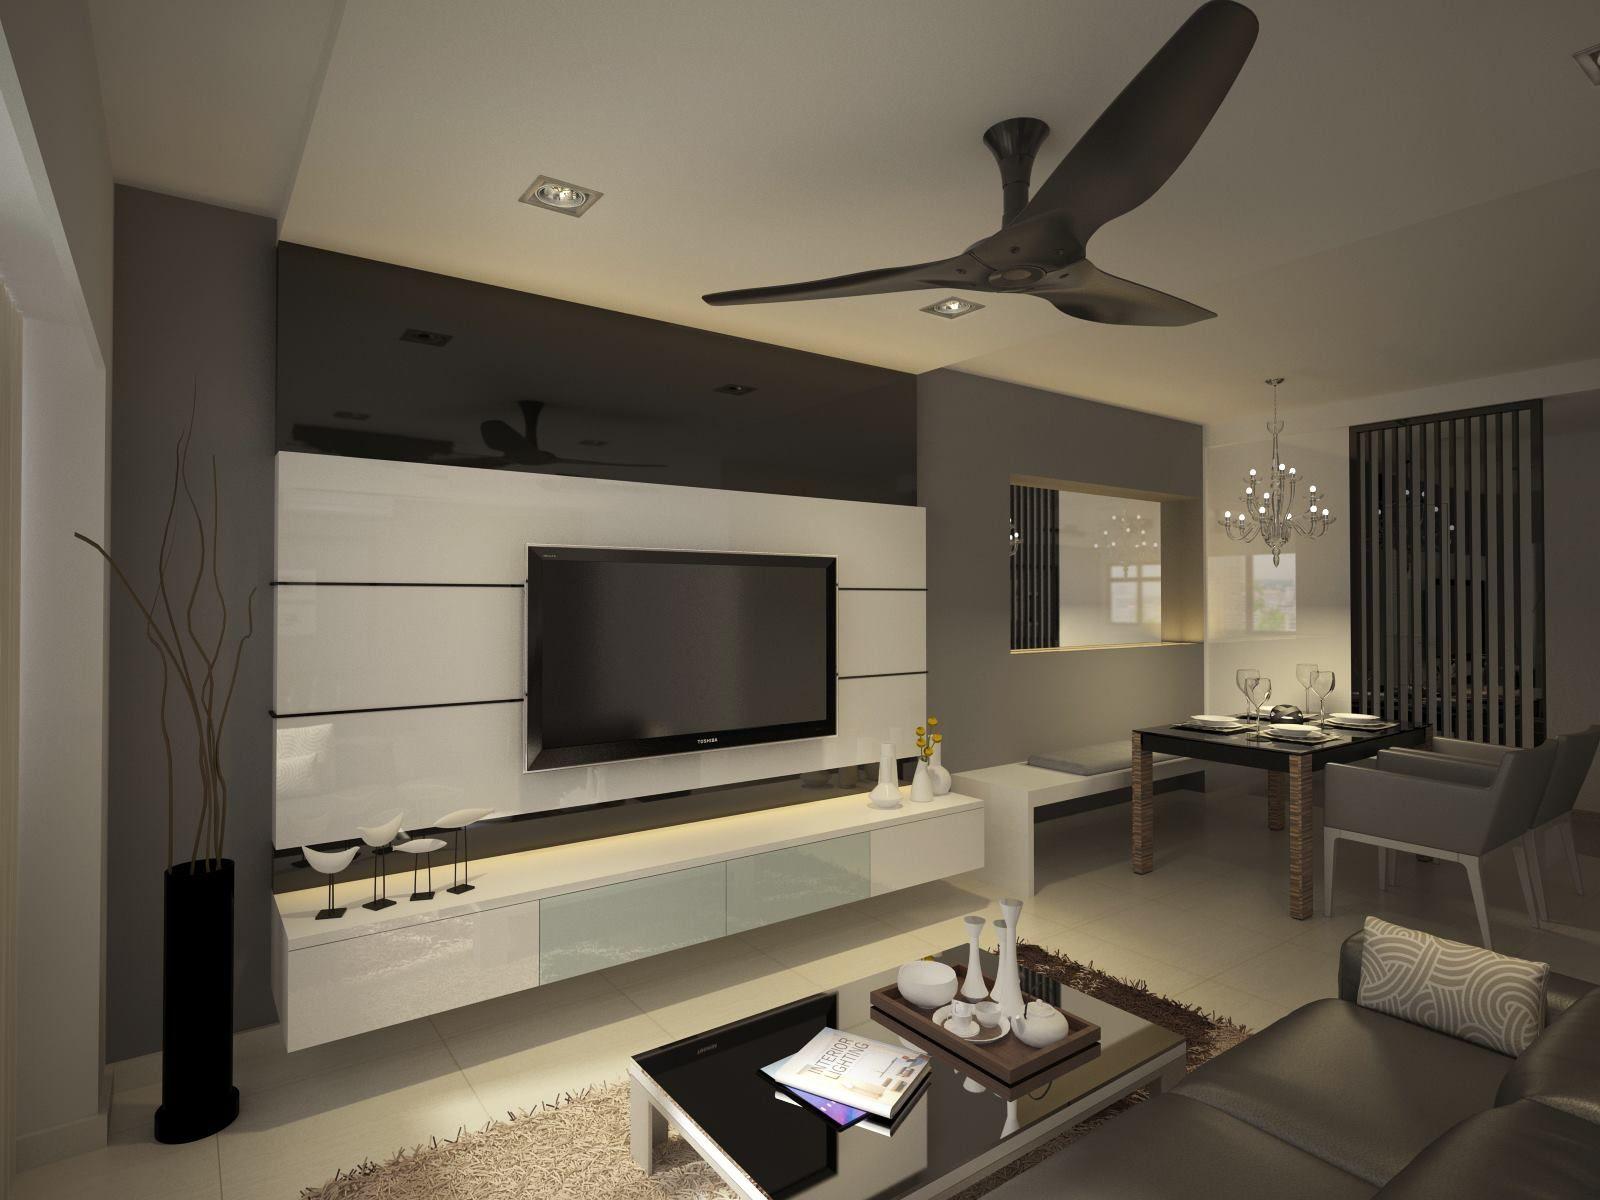 Hdb 5 Room At Blk 3 Holland Close Tv Cabinet Design Tv Cabinet Design Modern Living Room Designs